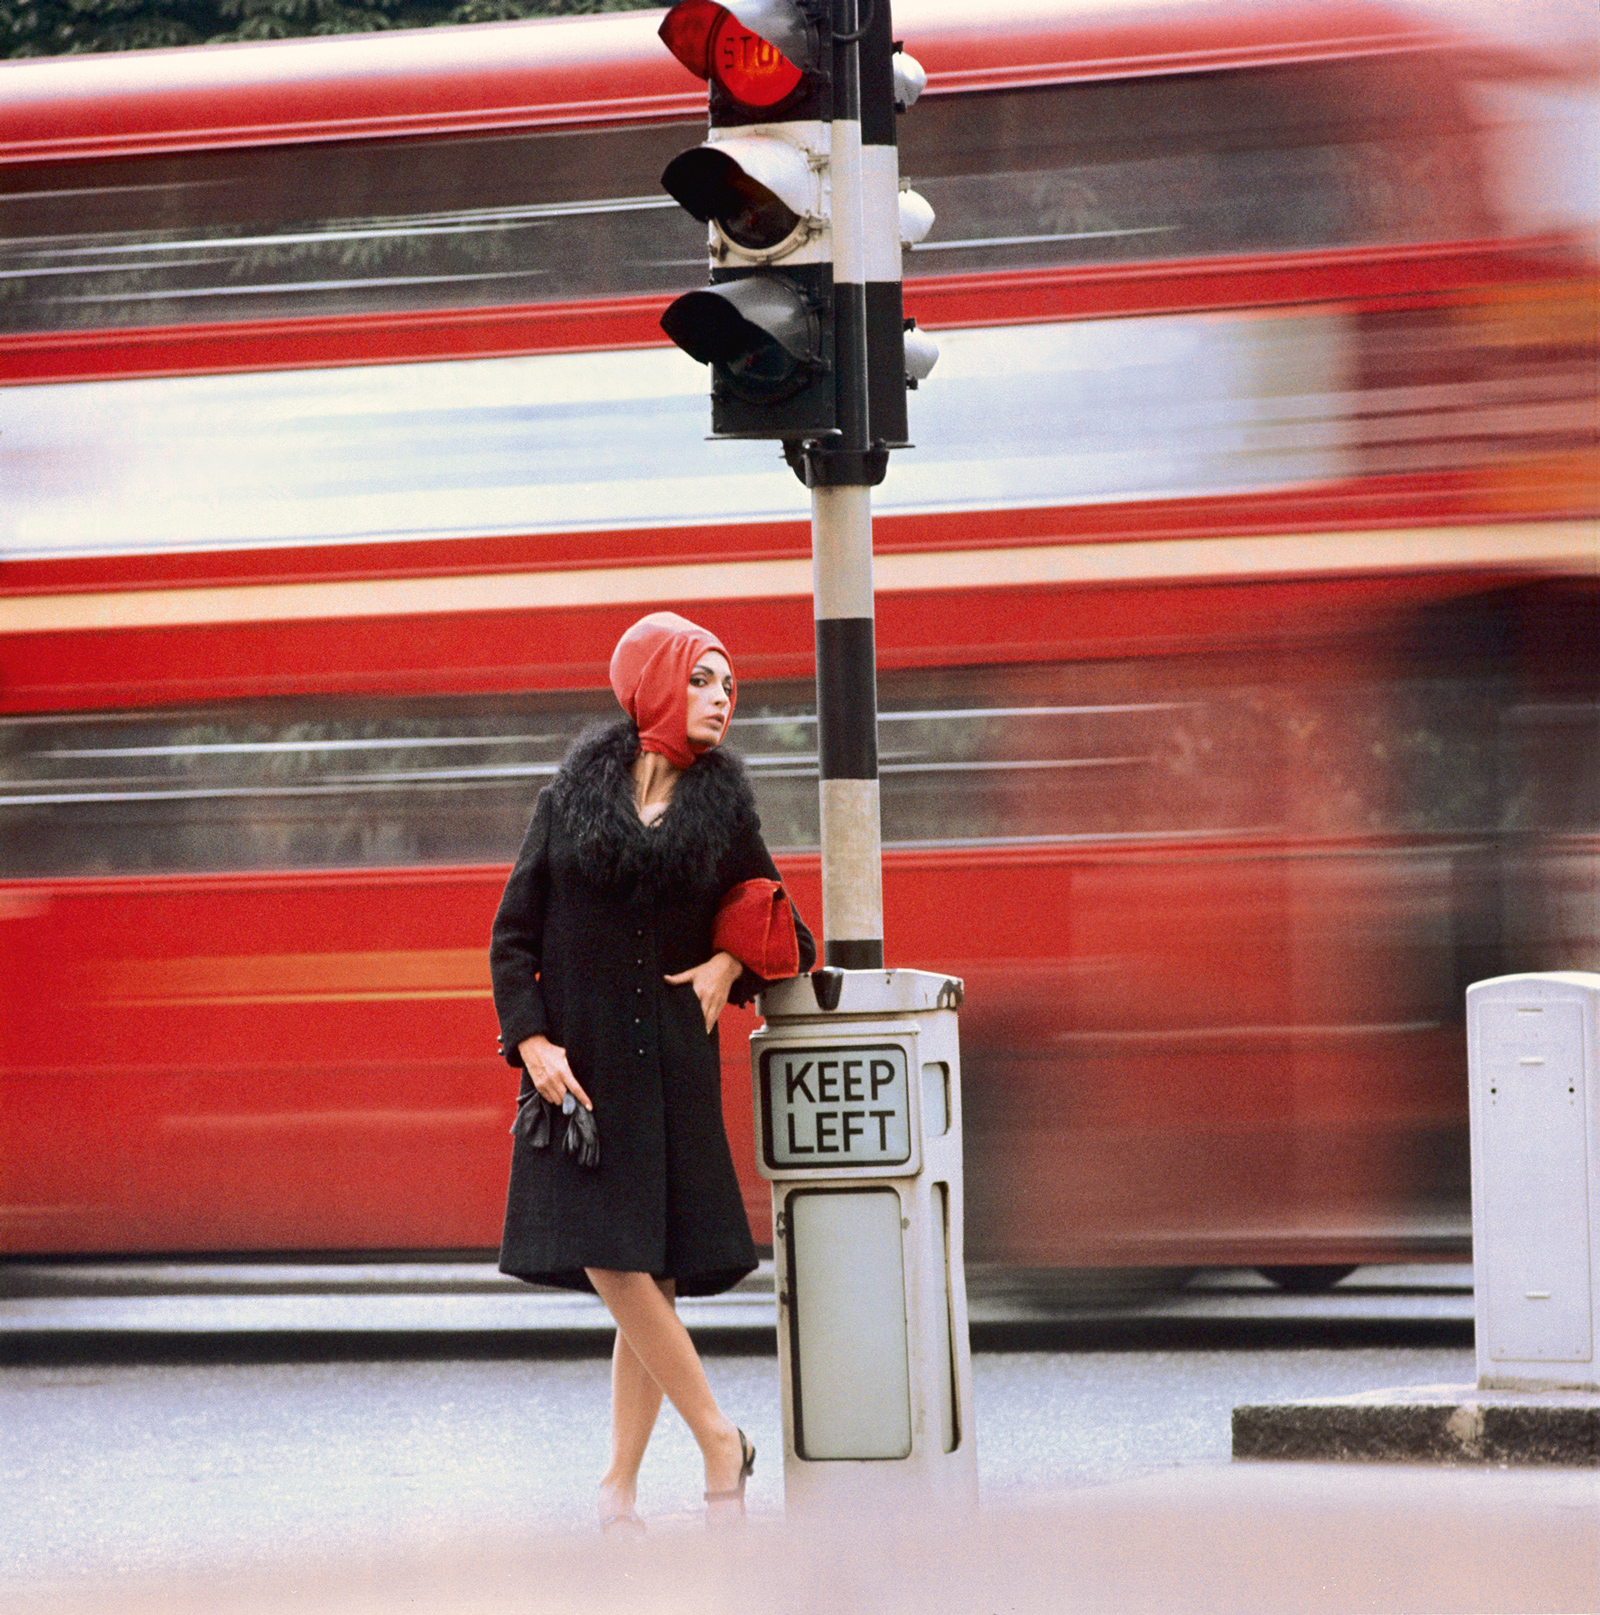 traffic-1960-c-norman-parkinson-ltd